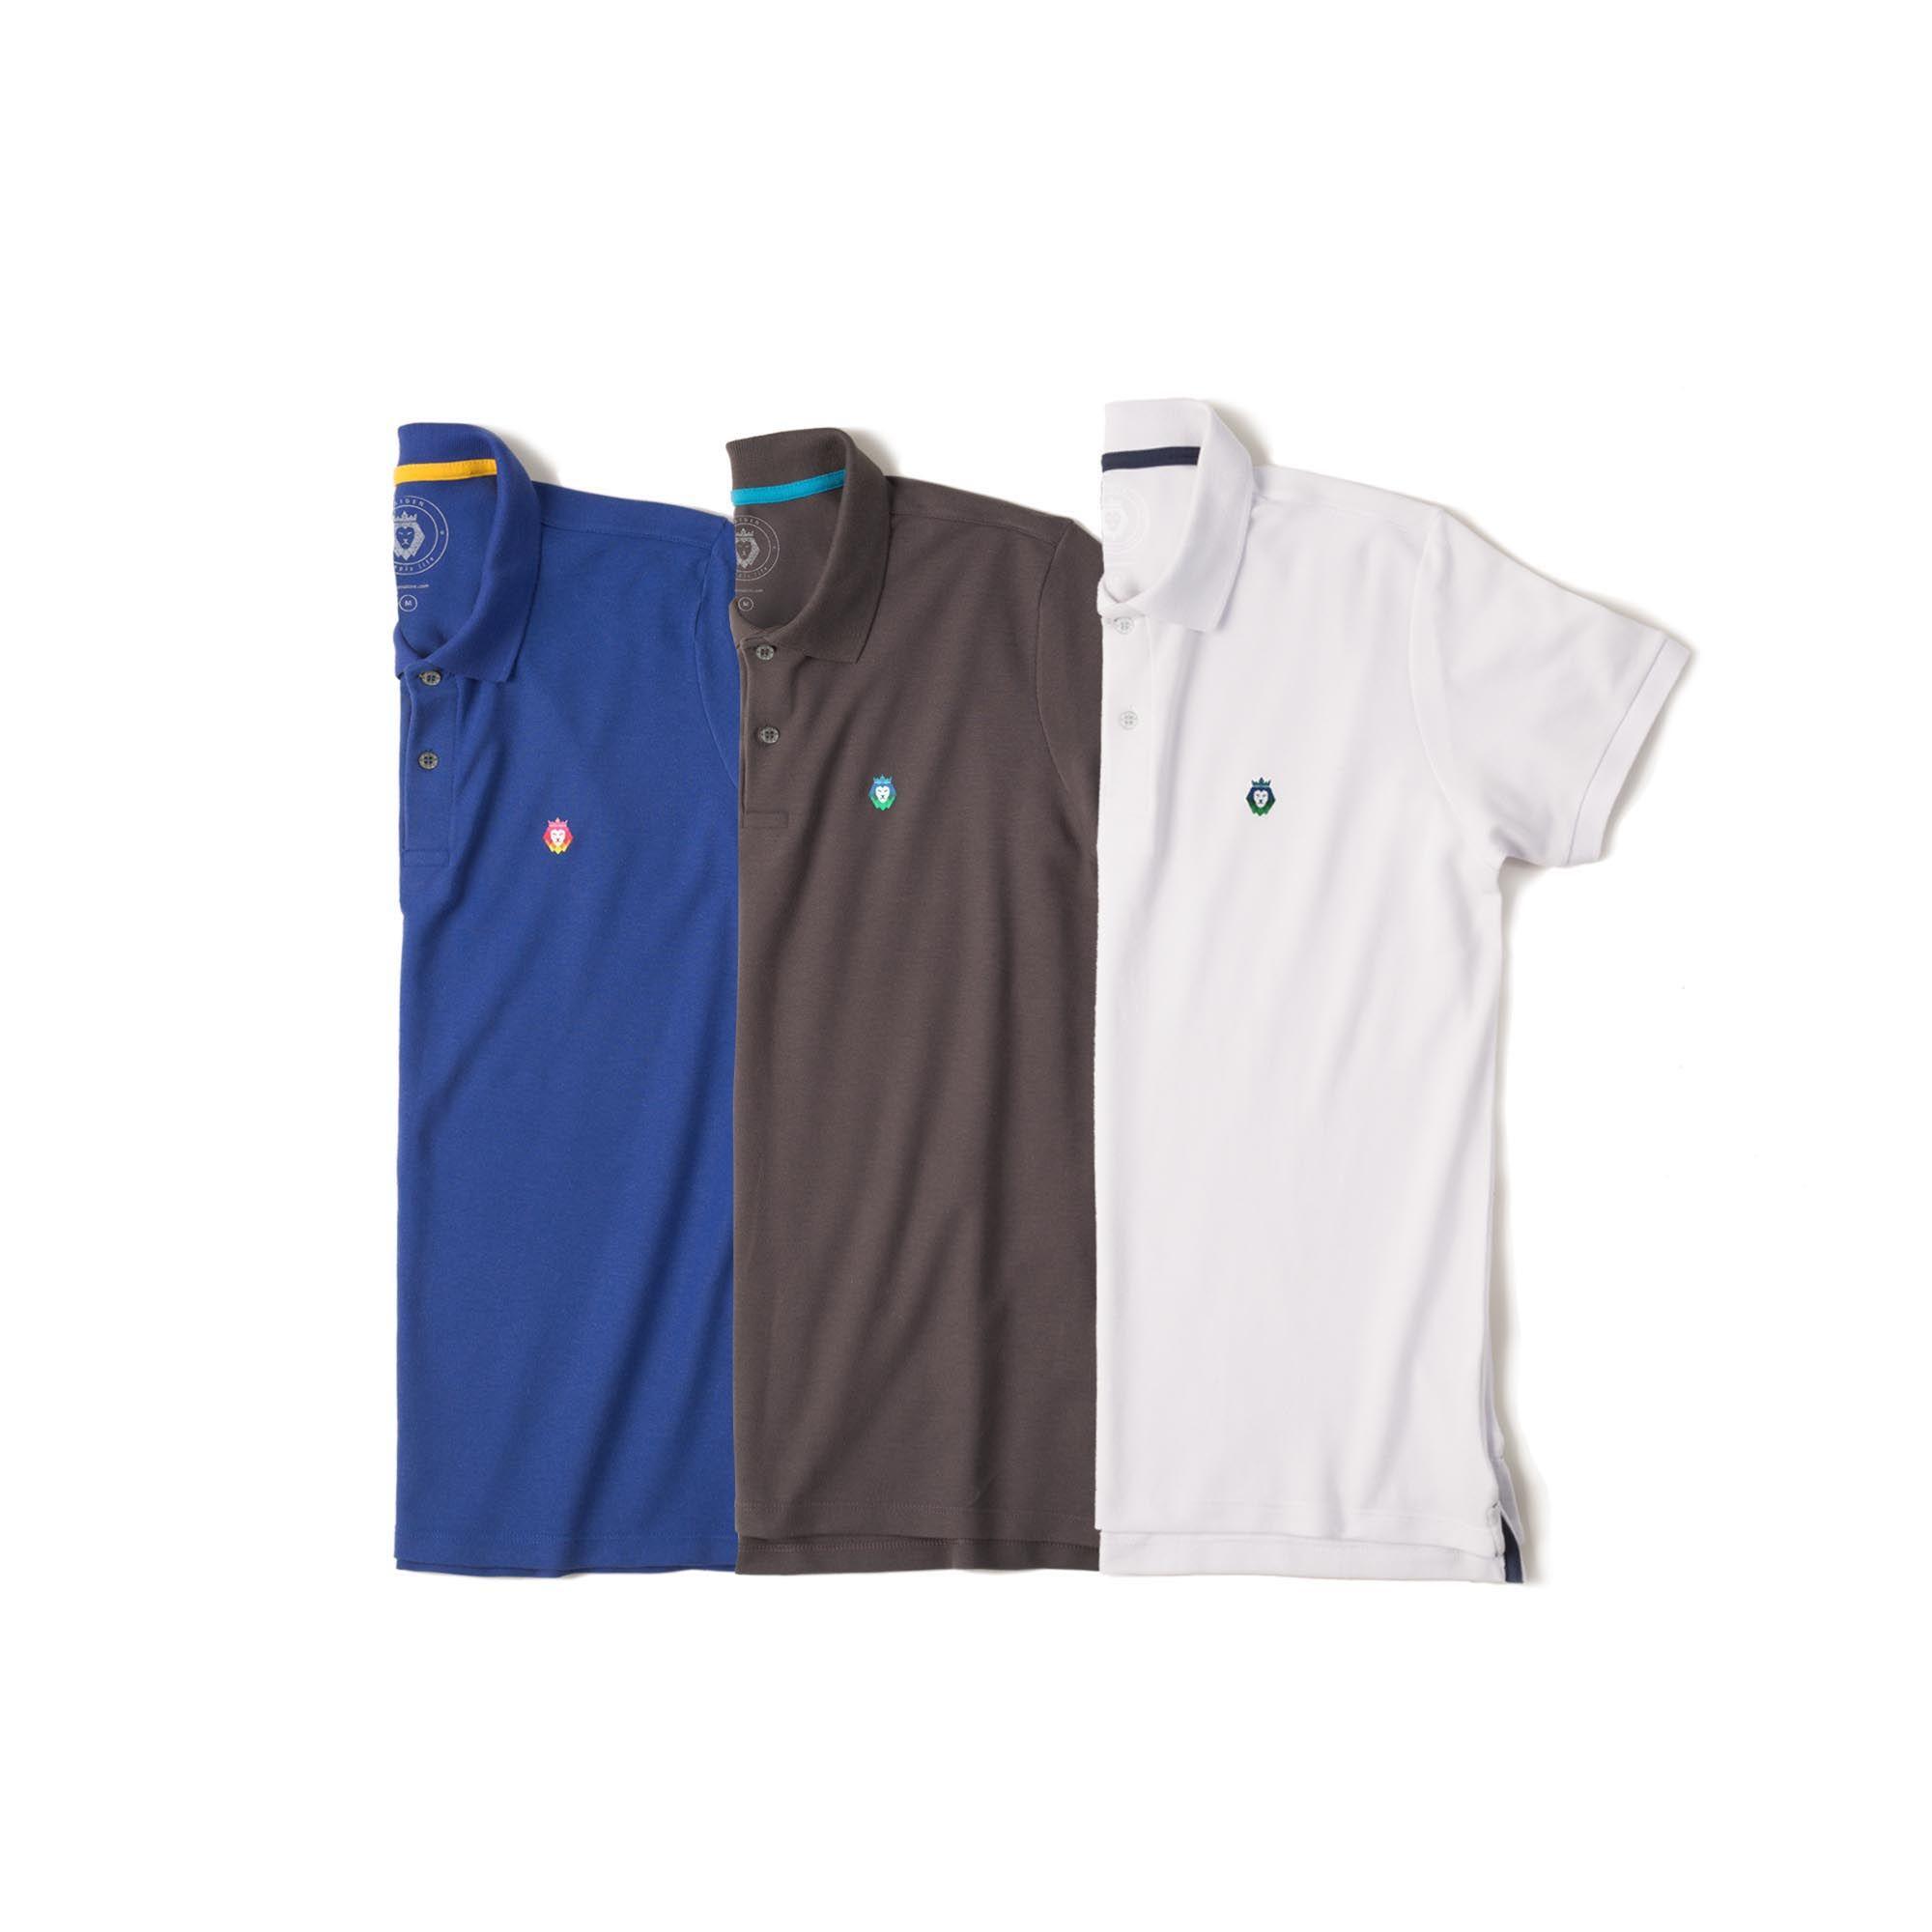 Kit 3 Camisas Polo Style Zaiden Royal Cinza Branca Masculina